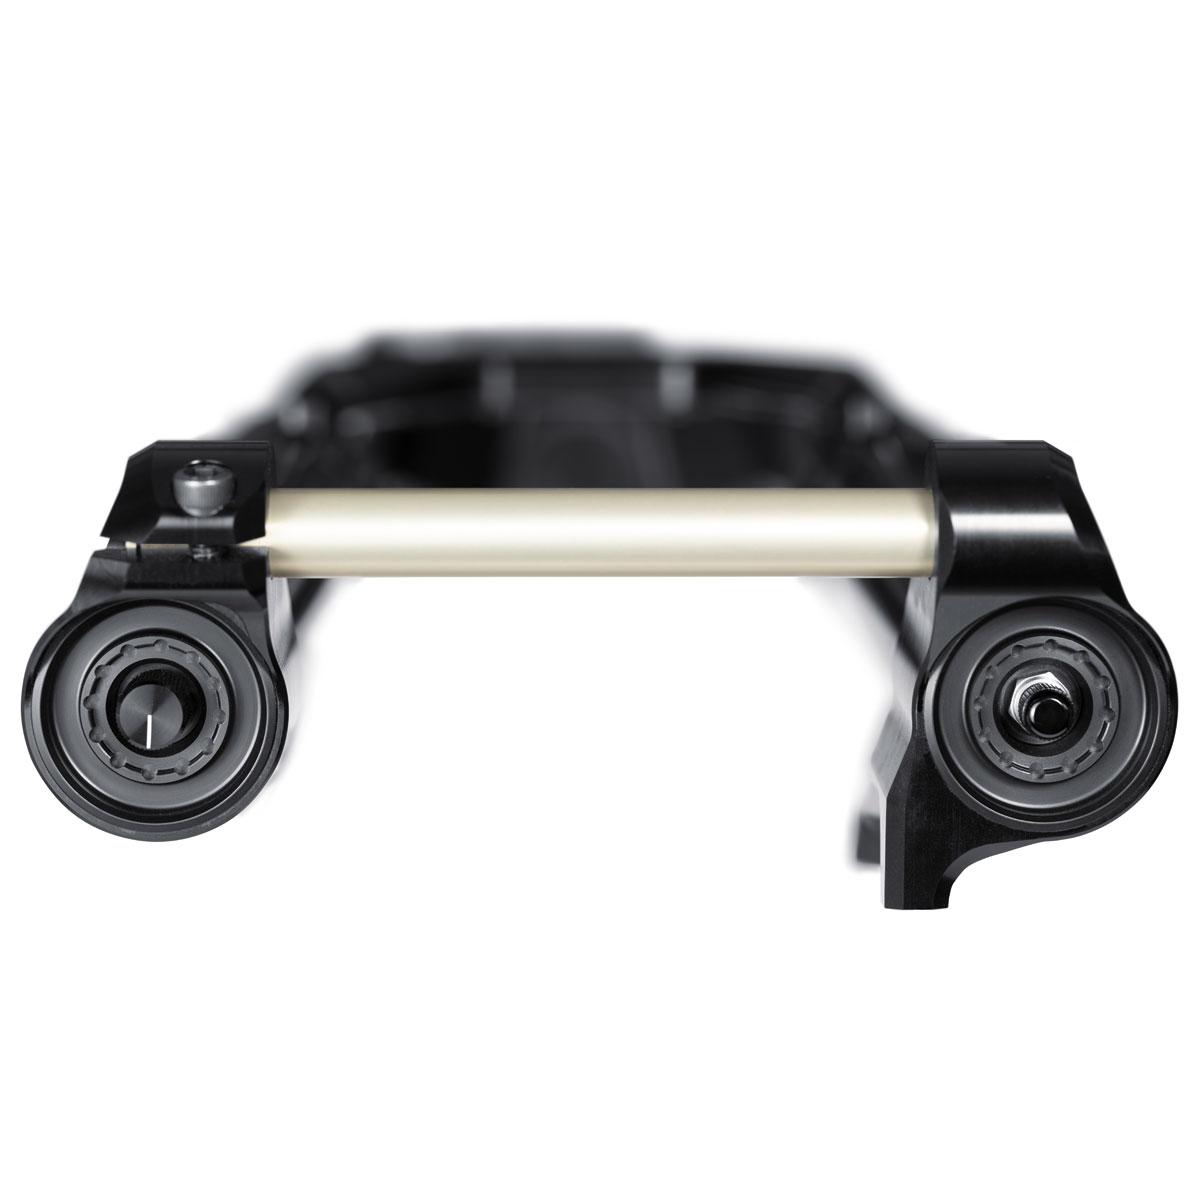 Image of Intend Blackline Ebonite 29 Inch Suspension Fork - 160mm - 44mm Offset - Tapered - 15x110mm Boost